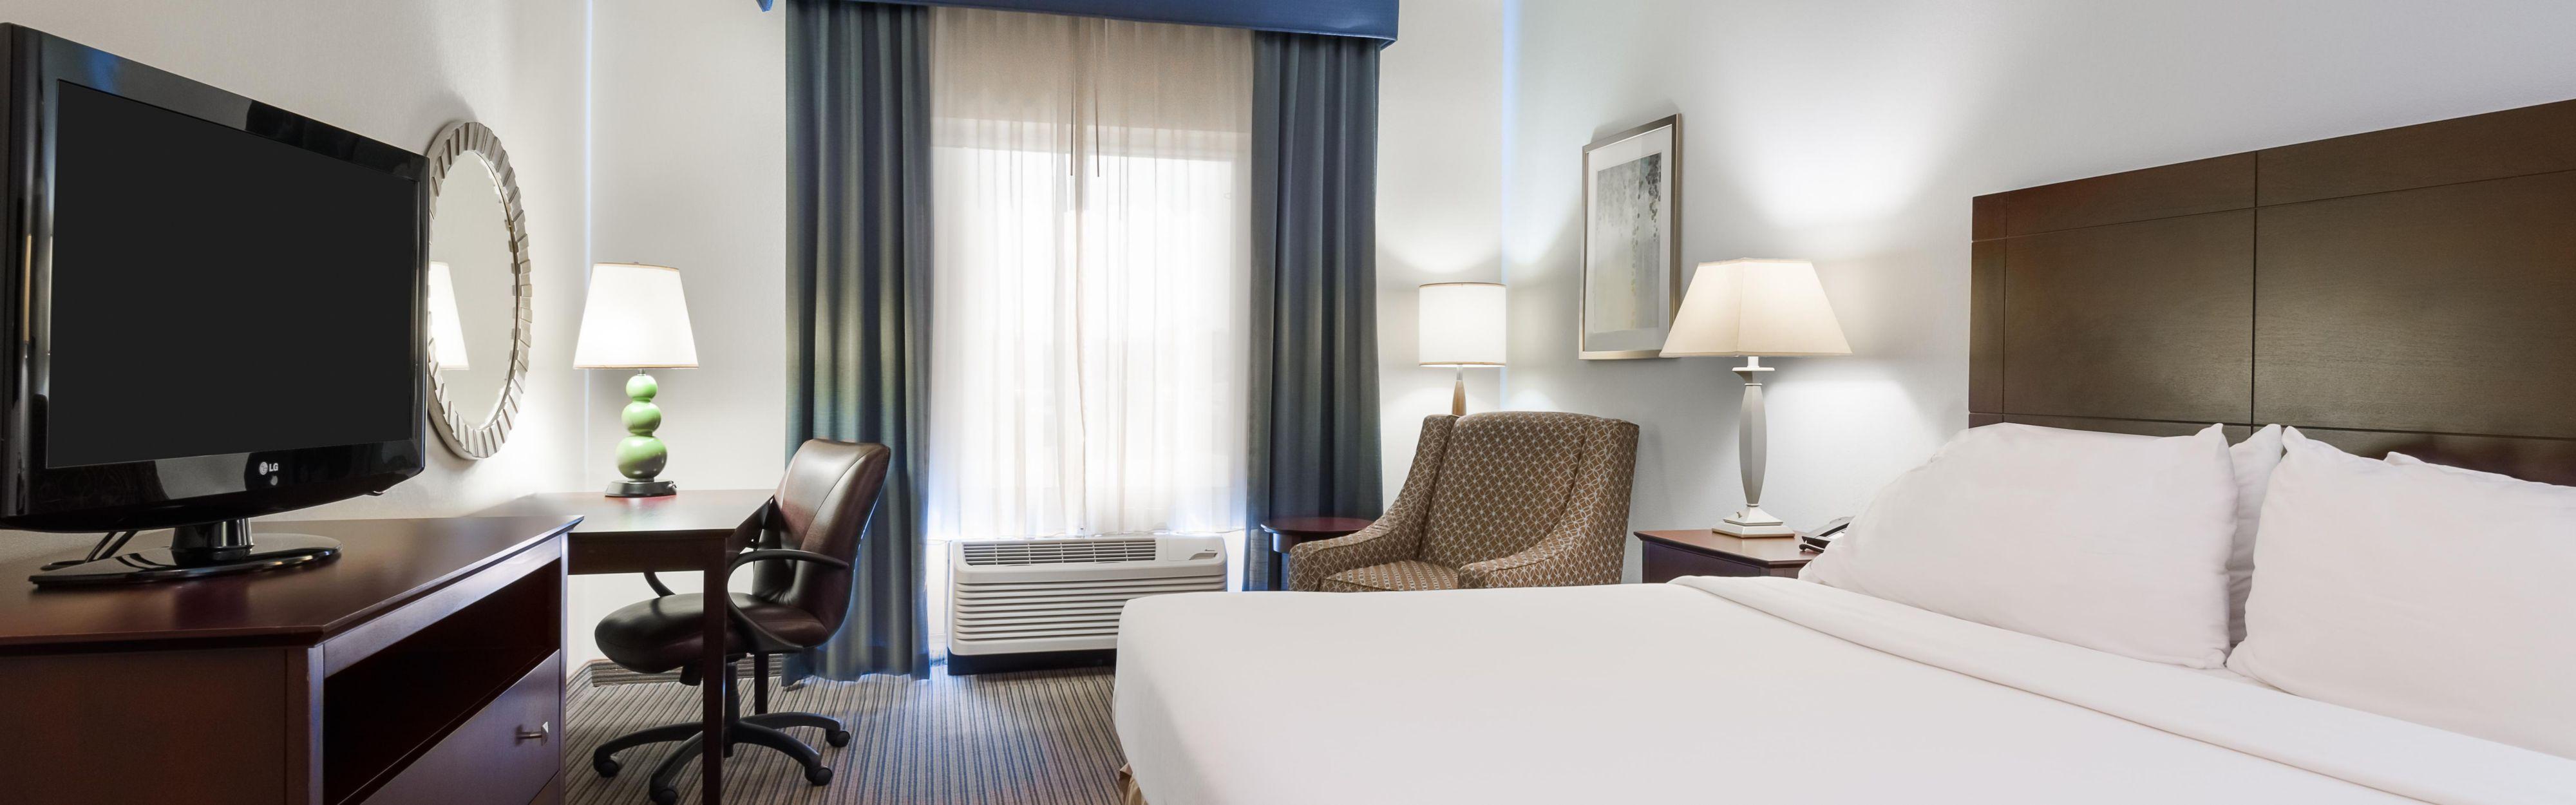 Holiday Inn Express & Suites New Iberia-Avery Island image 1